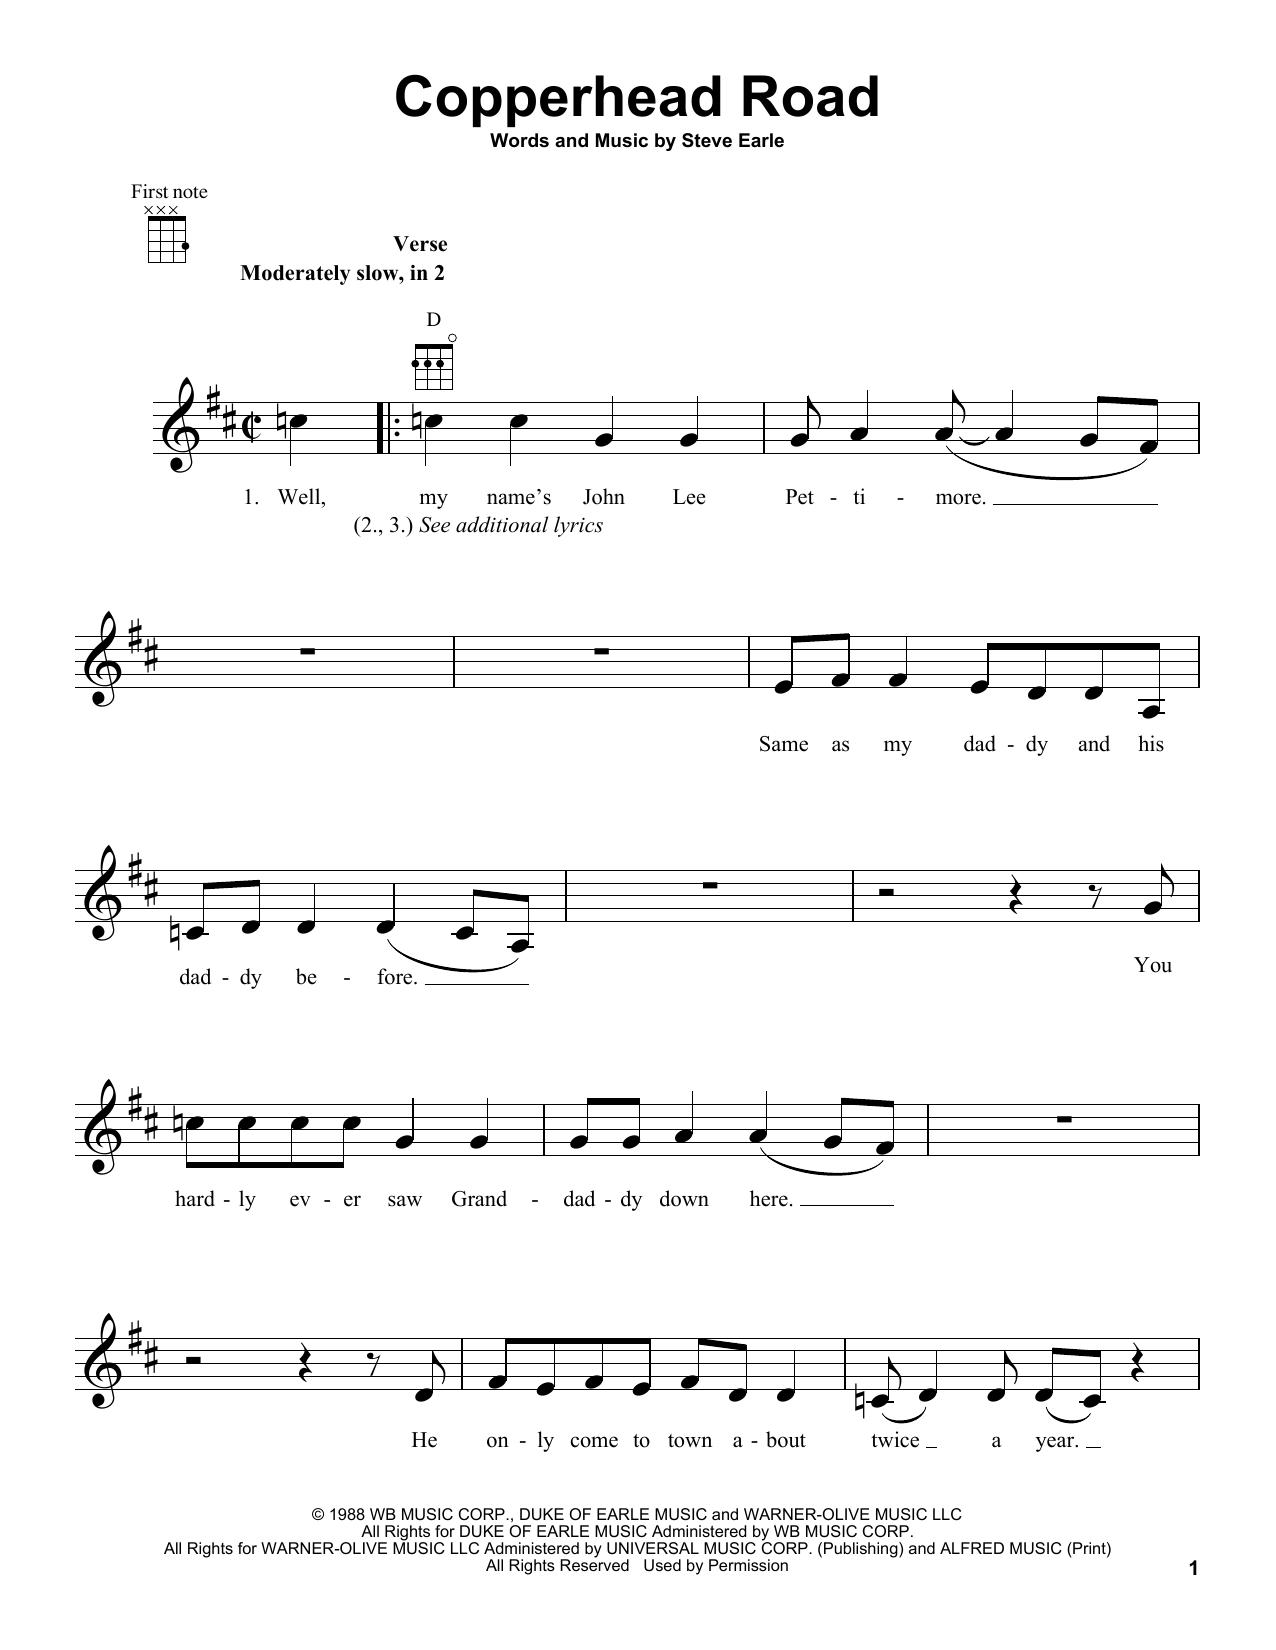 Steve Earle Copperhead Road Sheet Music Notes, Chords   Download Printable  Ukulele PDF Score   SKU 15